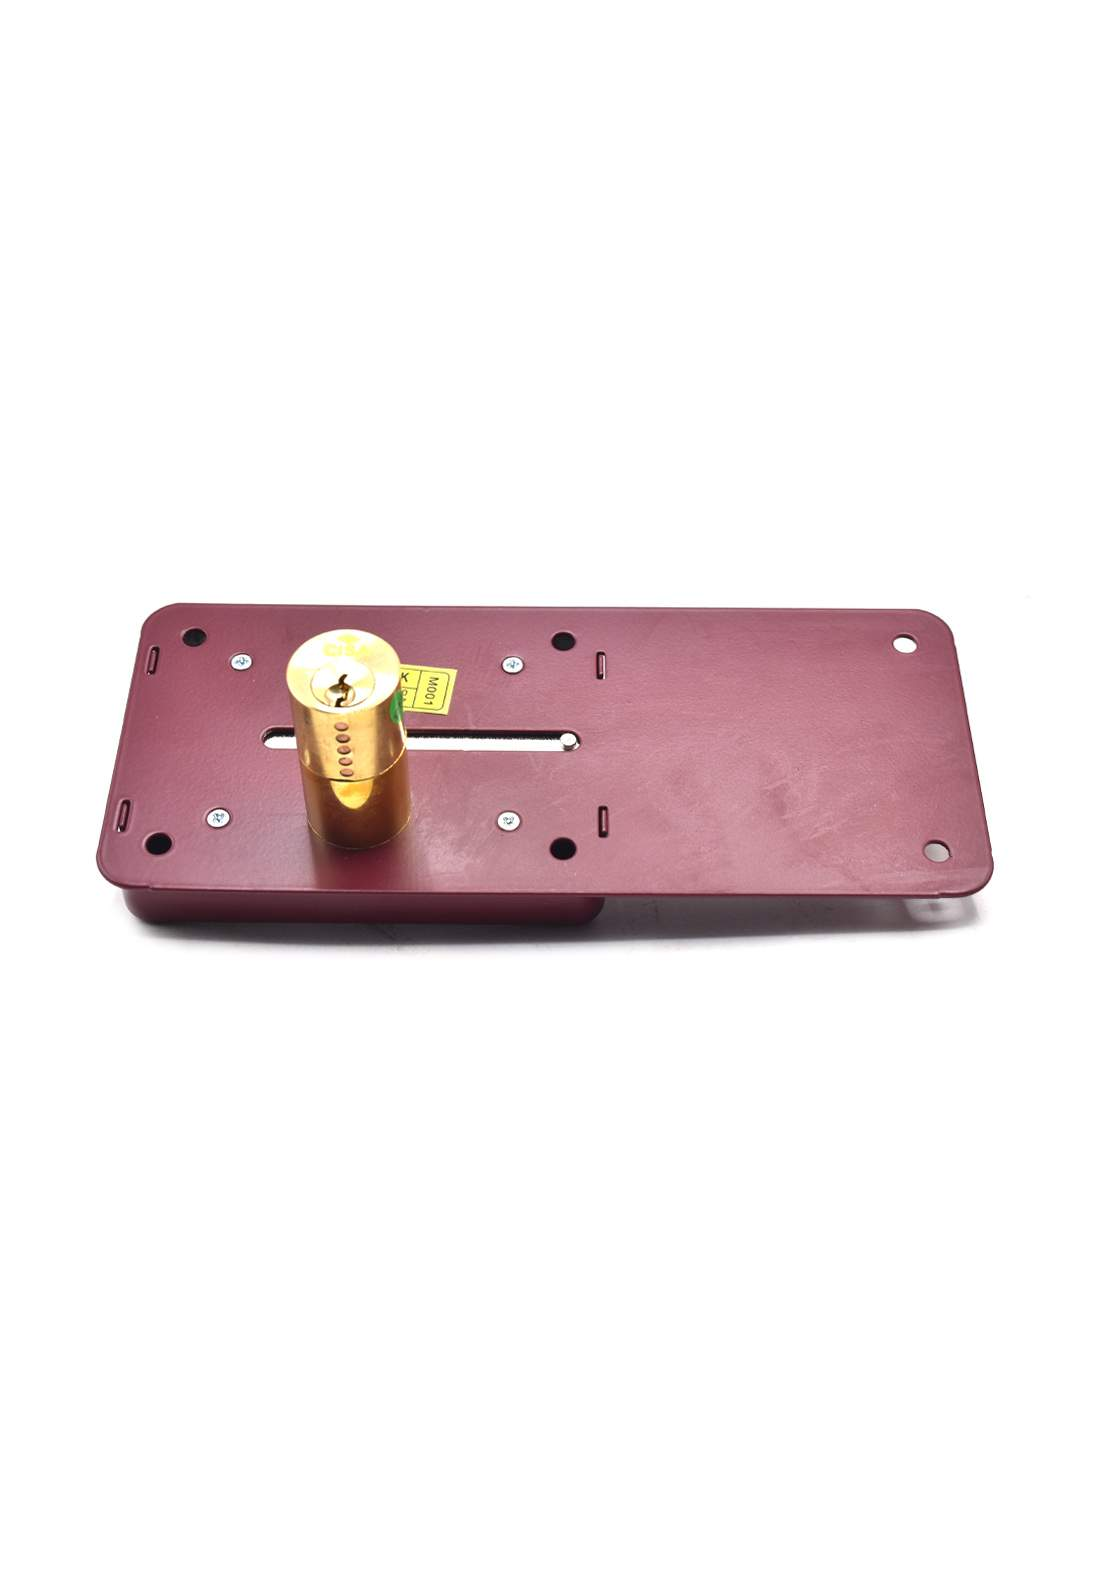 Cisa 55054-60-1 Lock قفل كبنك محلات 6 طقات